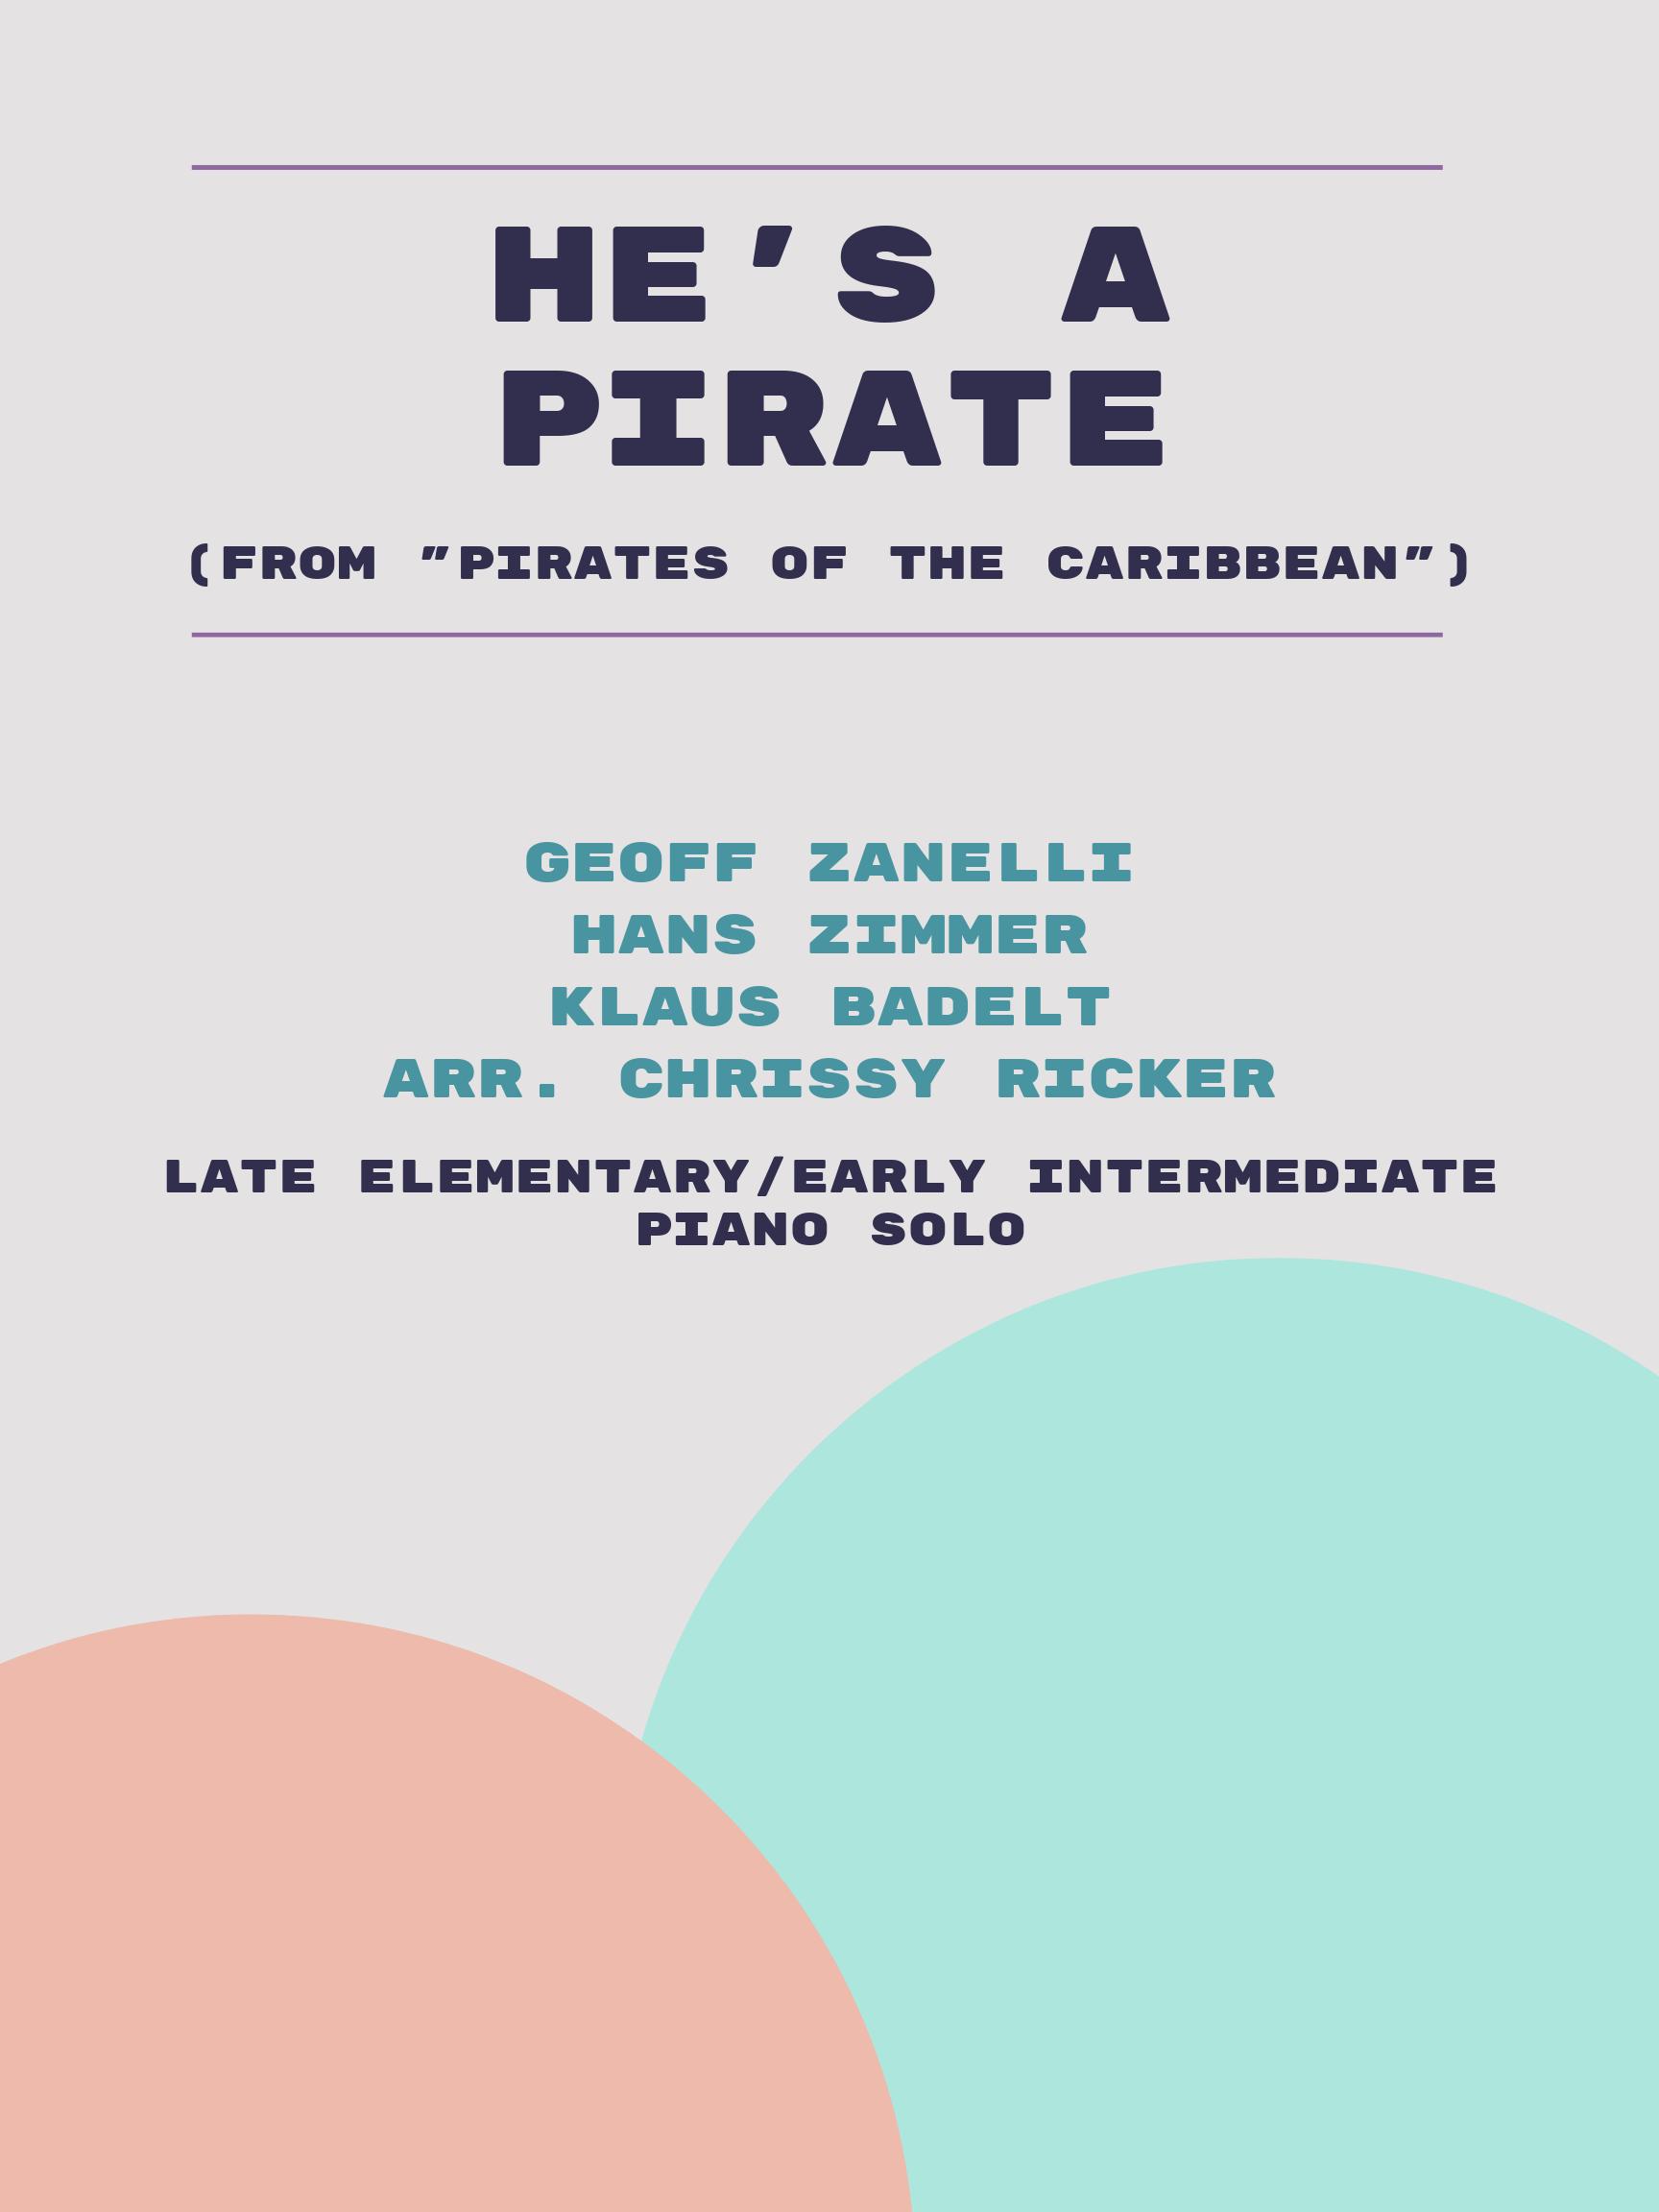 He's a Pirate by Geoff Zanelli, Hans Zimmer, Klaus Badelt